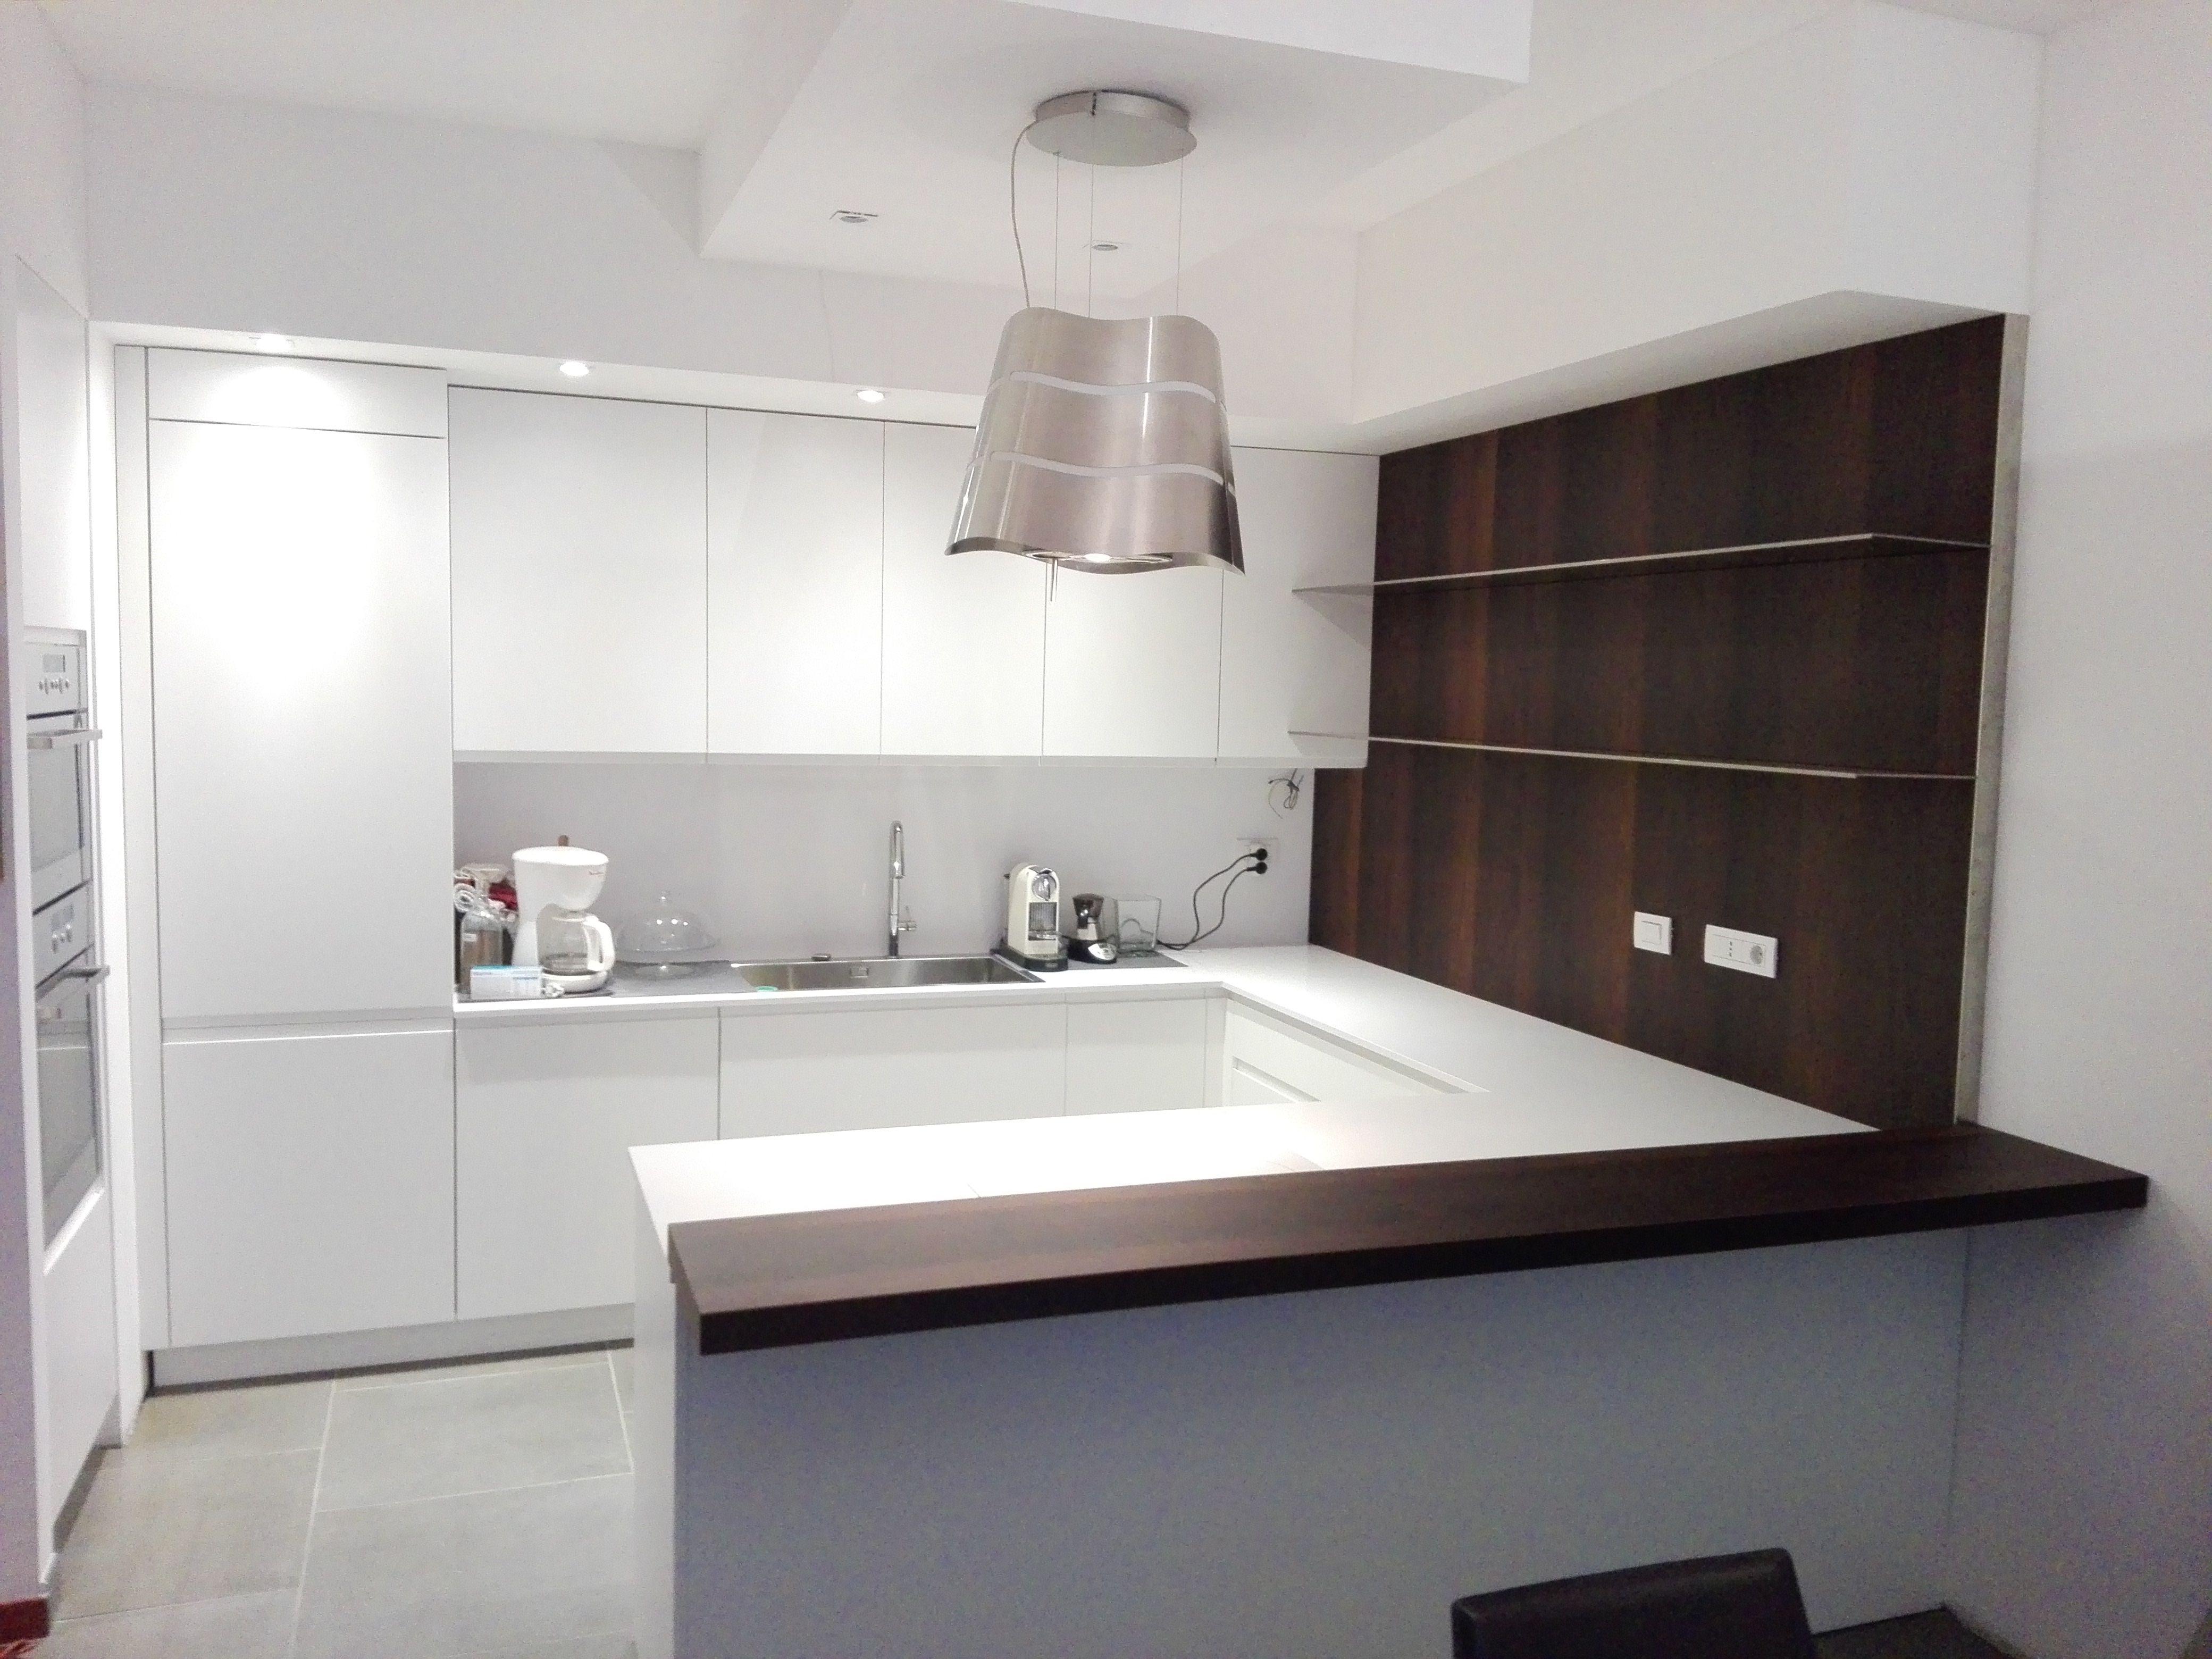 Cucina con penisola e boiserie in acacia affumicata by for Cucine moderne con penisola